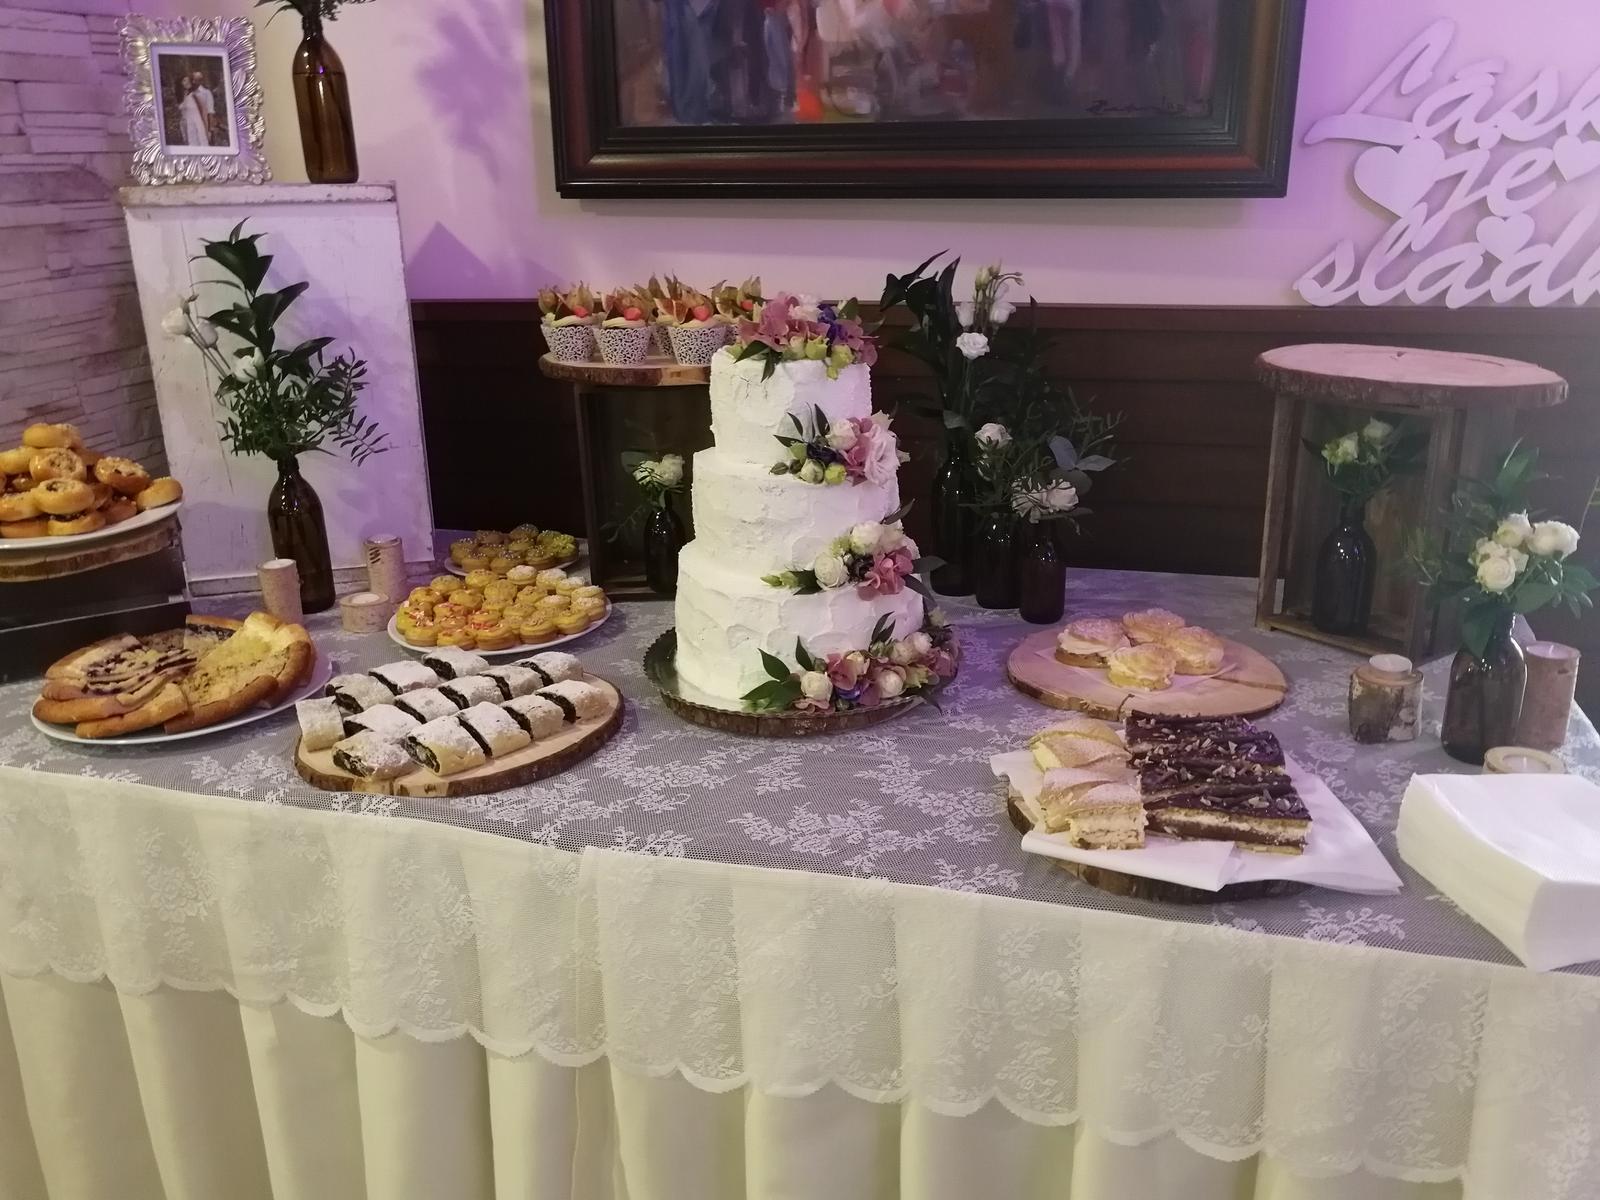 Svadba 29.9.2018 Hotel Kontakt - Obrázok č. 32